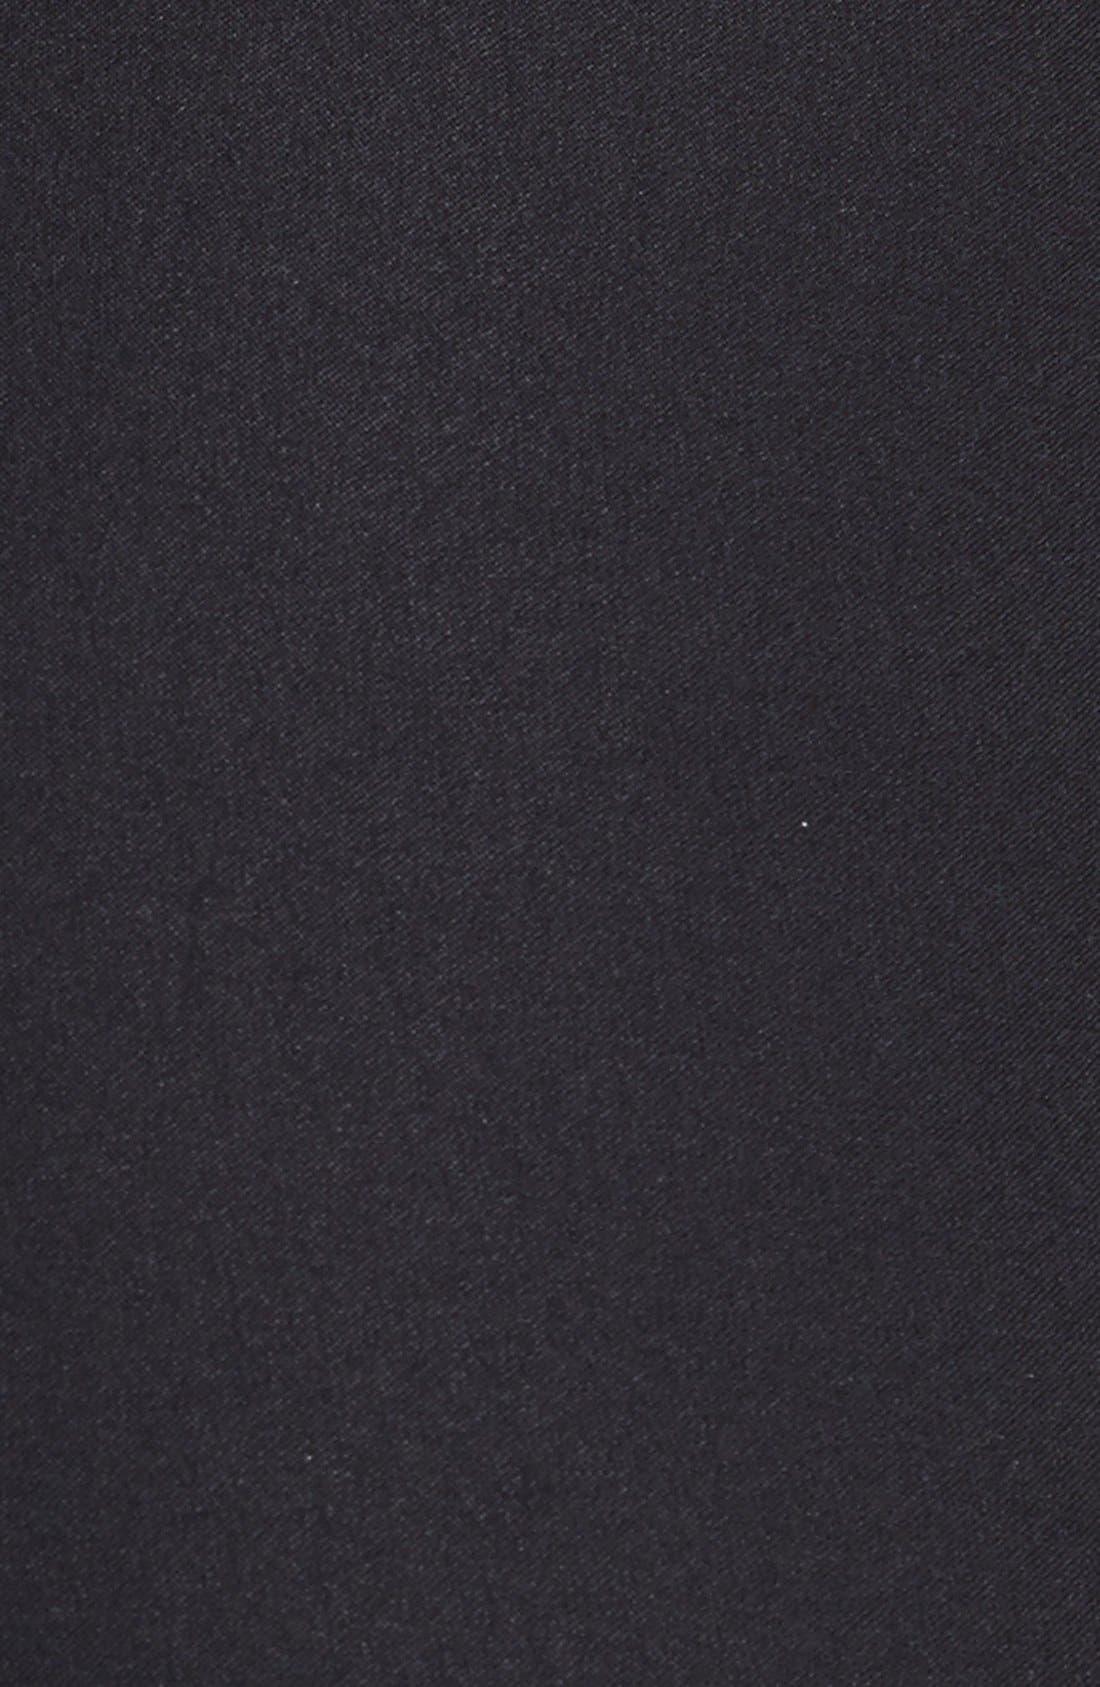 Wonderstretch Straight Leg Pants,                             Alternate thumbnail 9, color,                             BLACK ONYX